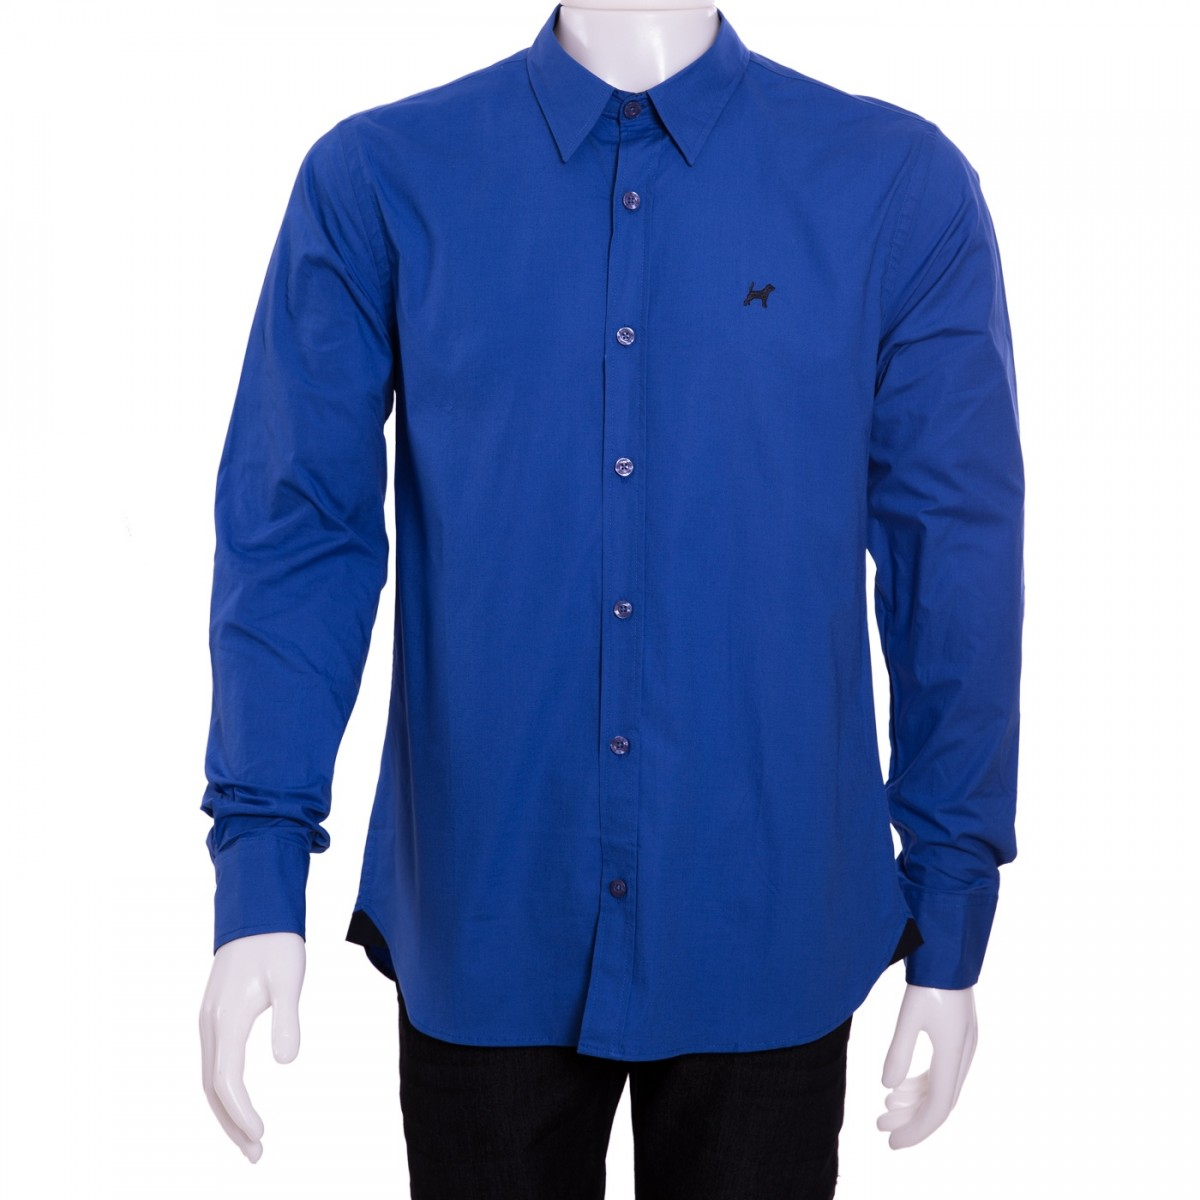 Bizz Store - Camisa Social Masculina Beagle Manga Longa Preto Azul 8dc832c6089